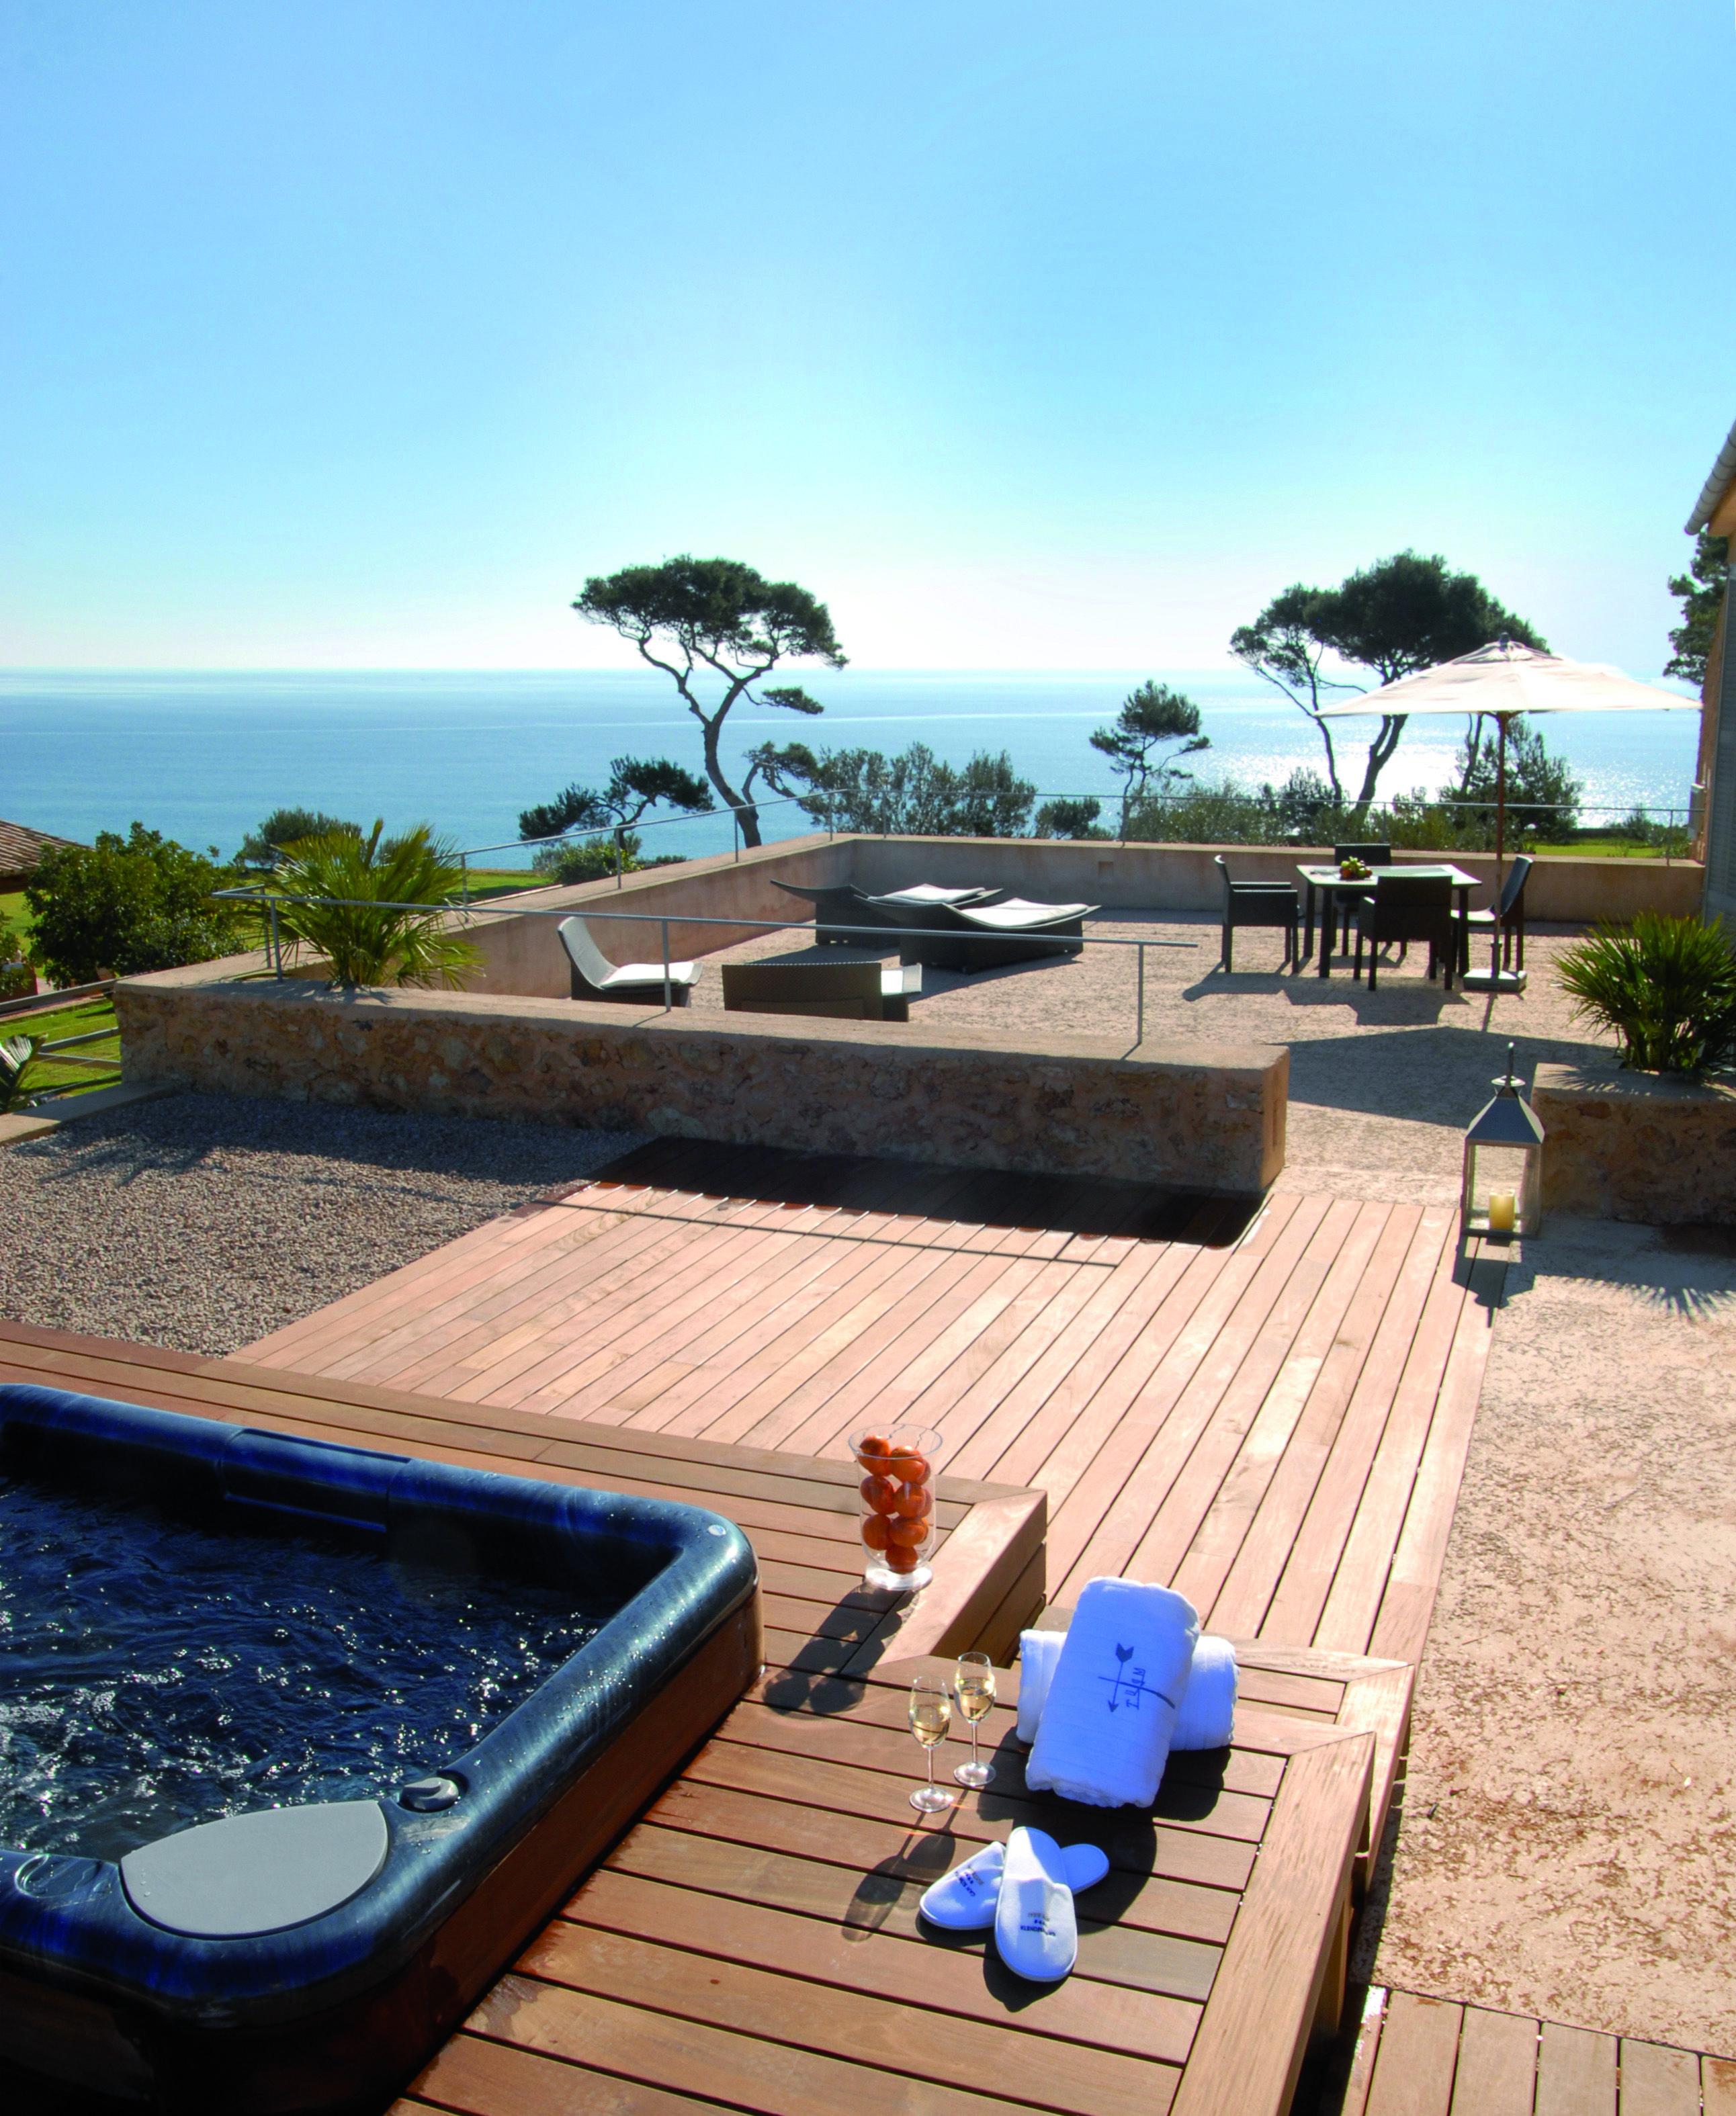 Hotel Can Simoneta   Boutique Hotel   Spain   http://lifestylehotels.net/en/can-simoneta   outdoor, view, terrace, jacuzzi, Relaxing, wellness